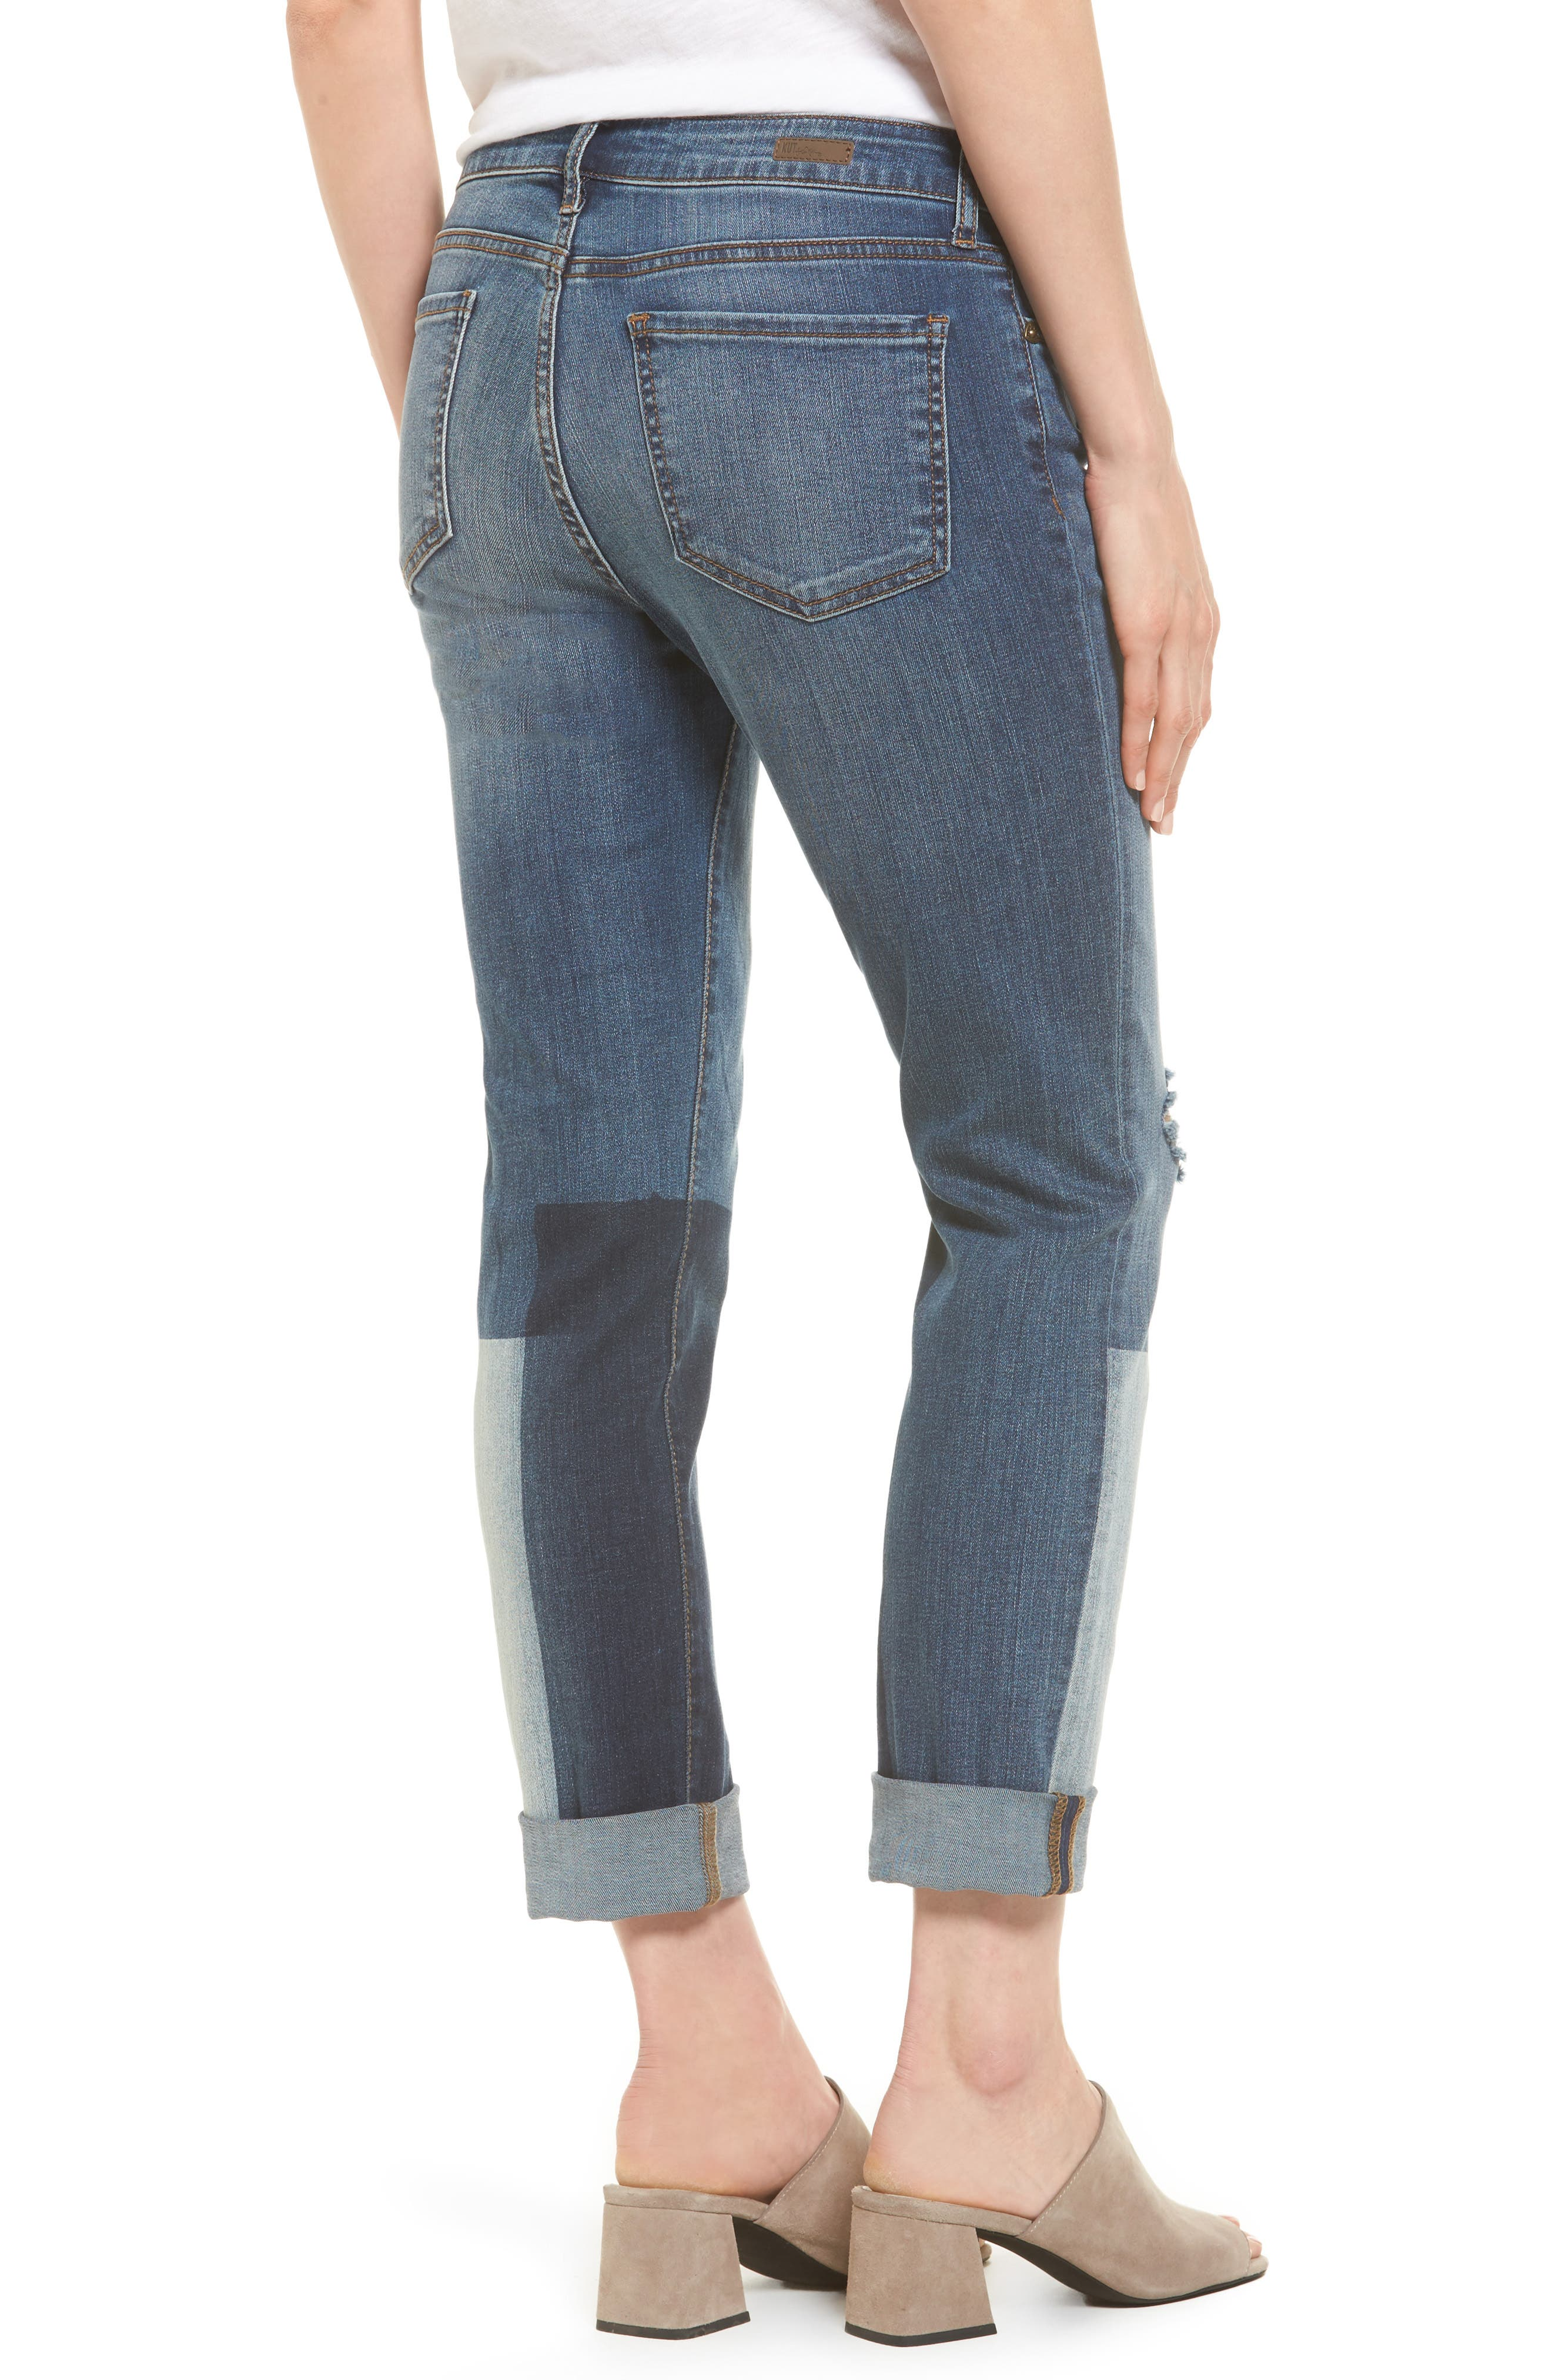 Catherine Colorblock Slim Boyfriend Jeans,                             Alternate thumbnail 2, color,